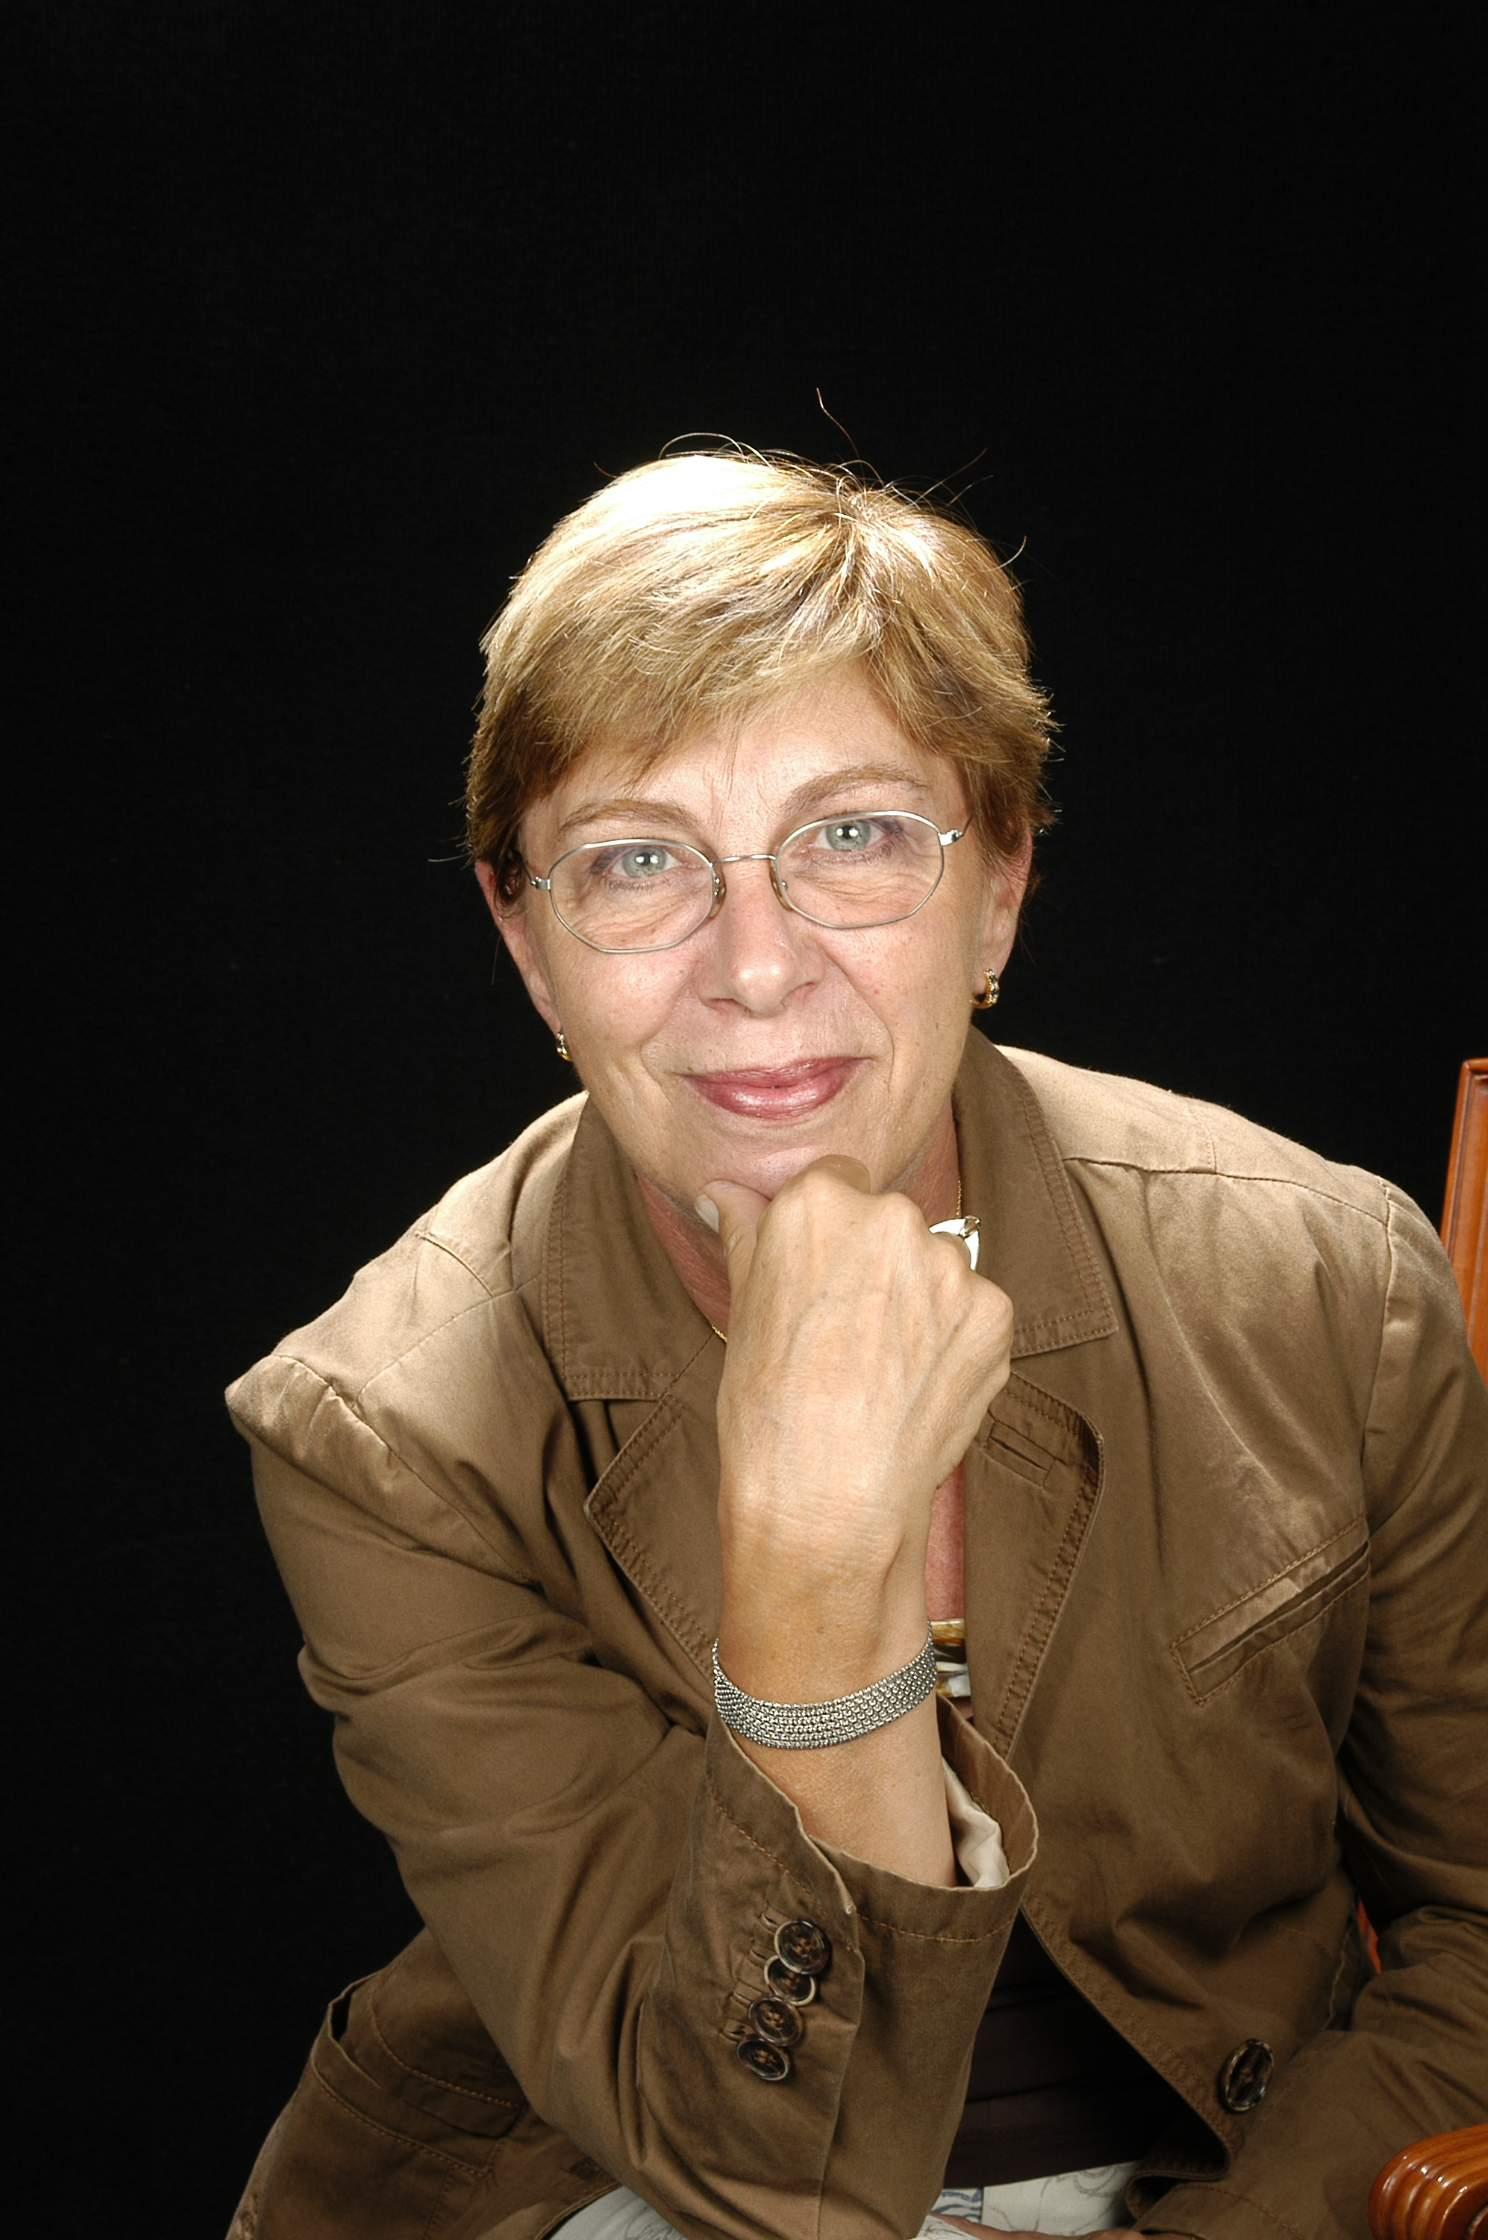 Sra. Mª Concepción Antolín Munfort